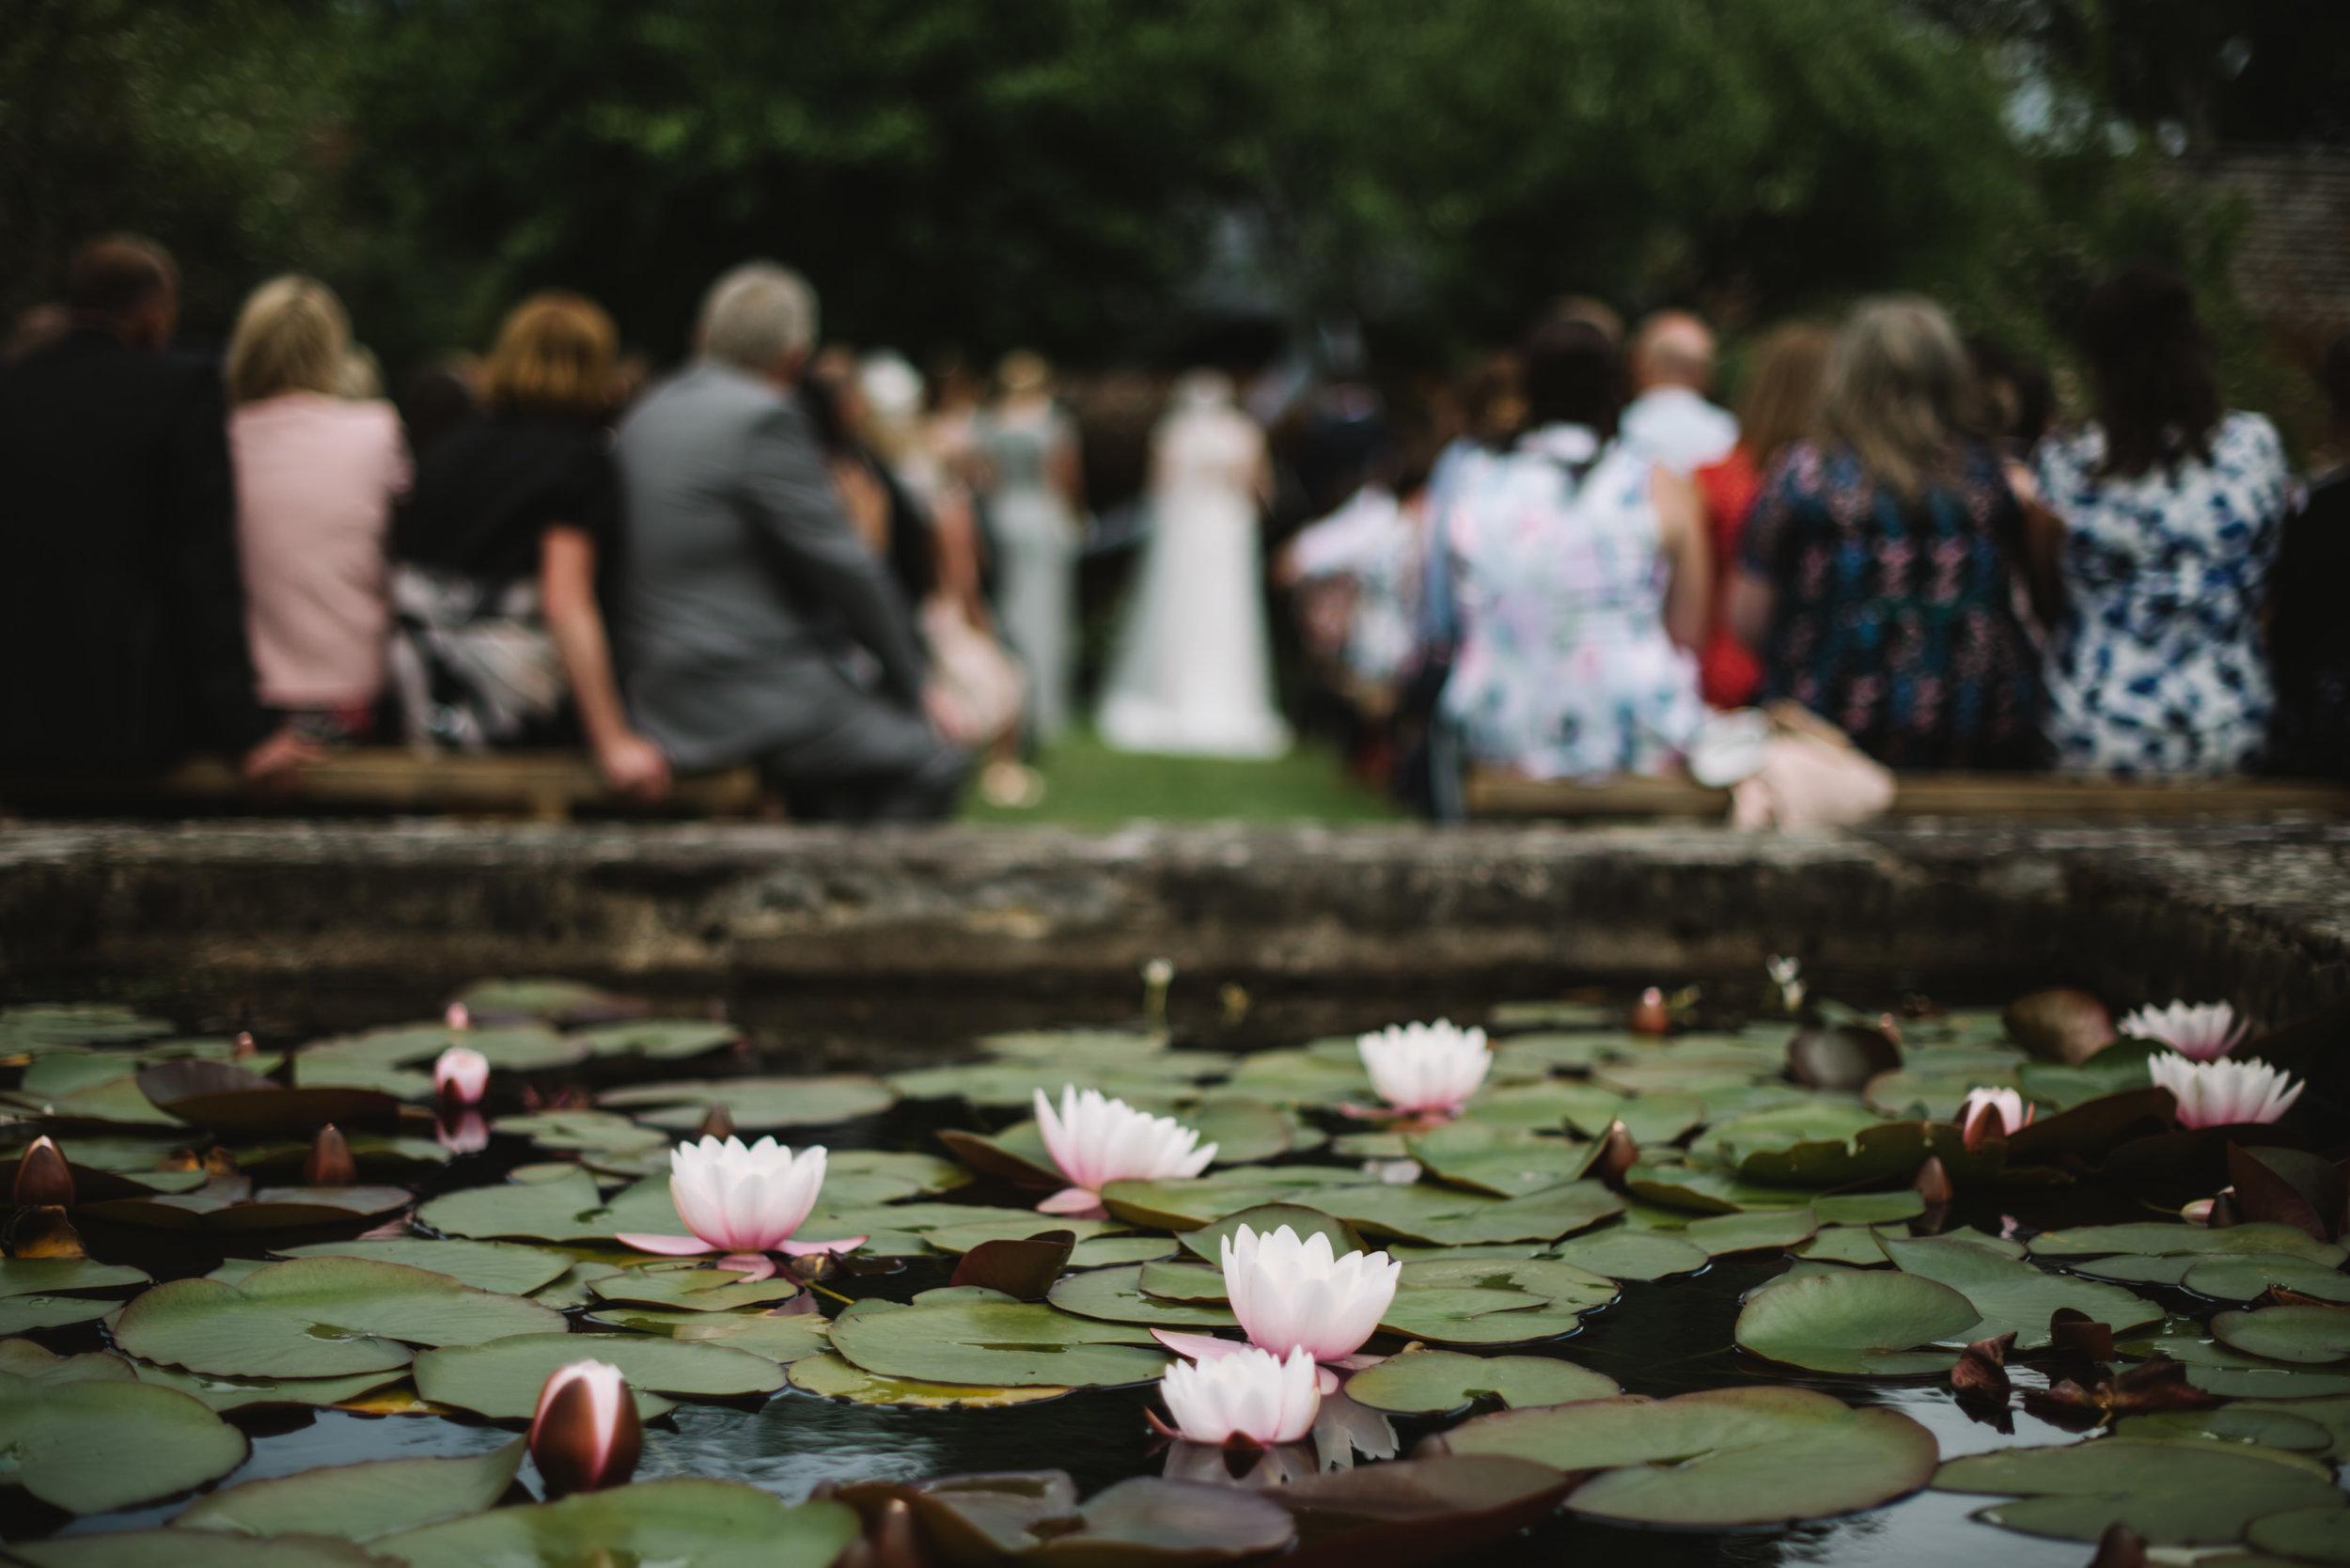 0048-LISA-DEVINE-PHOTOGRAPHY-ALTERNATIVE-WEDDING-PHOTOGRAPHY-SCOTLAND-DESTINATION-WEDDINGS-GLASGOW-WEDDINGS-COOL-WEDDINGS-STYLISH-WEDDINGS.JPG